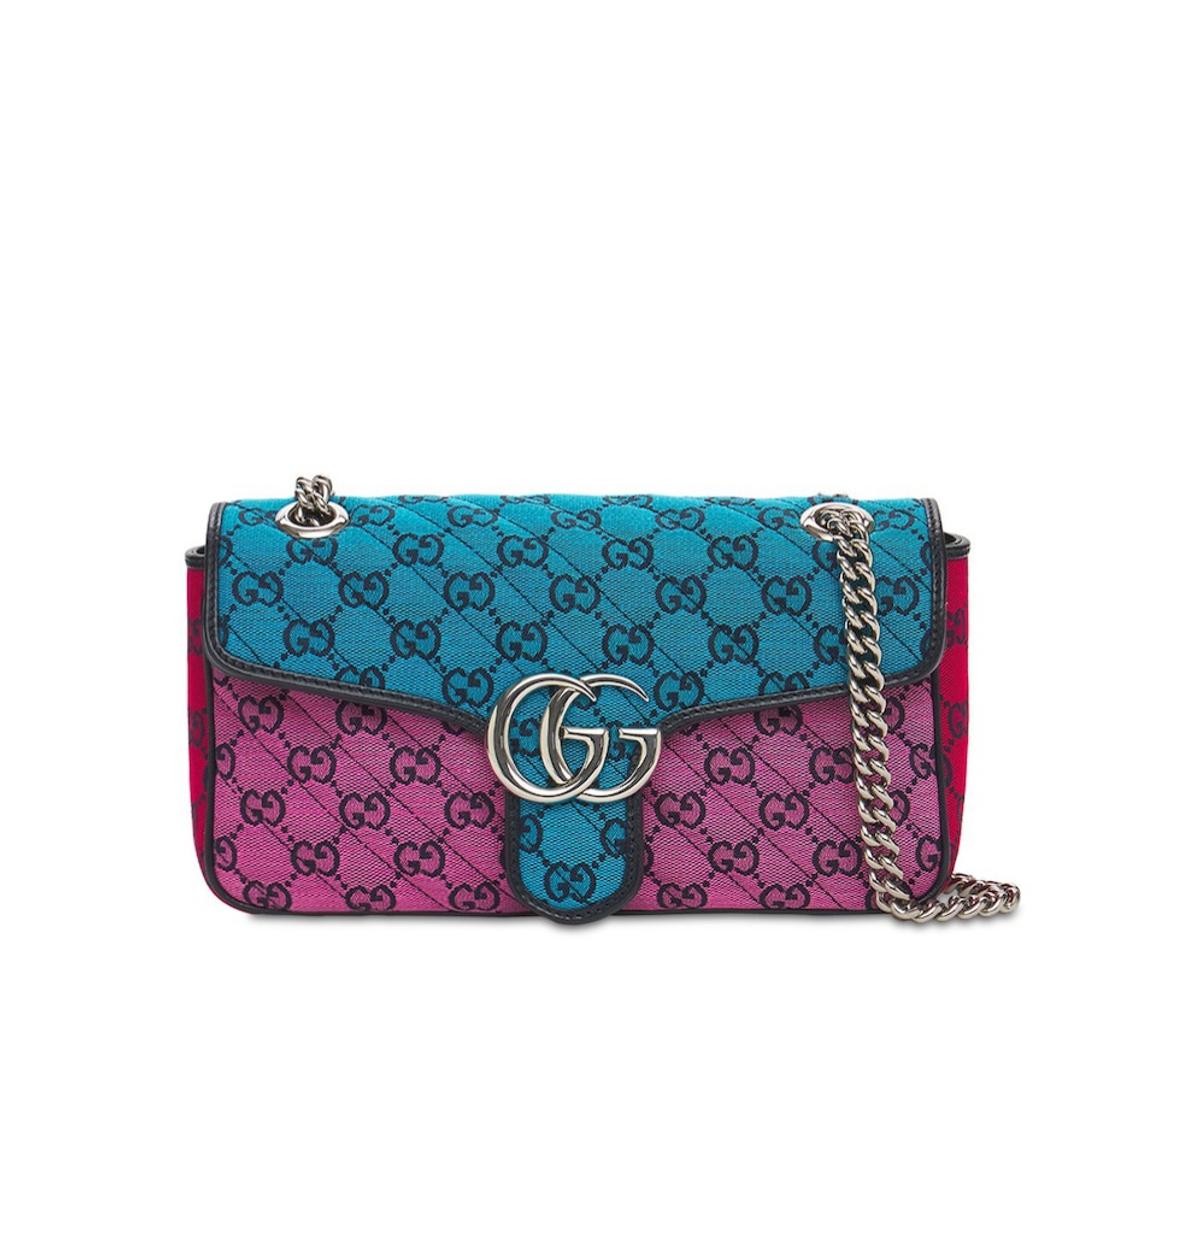 Small GG Marmont Multicolor Canvas Bag